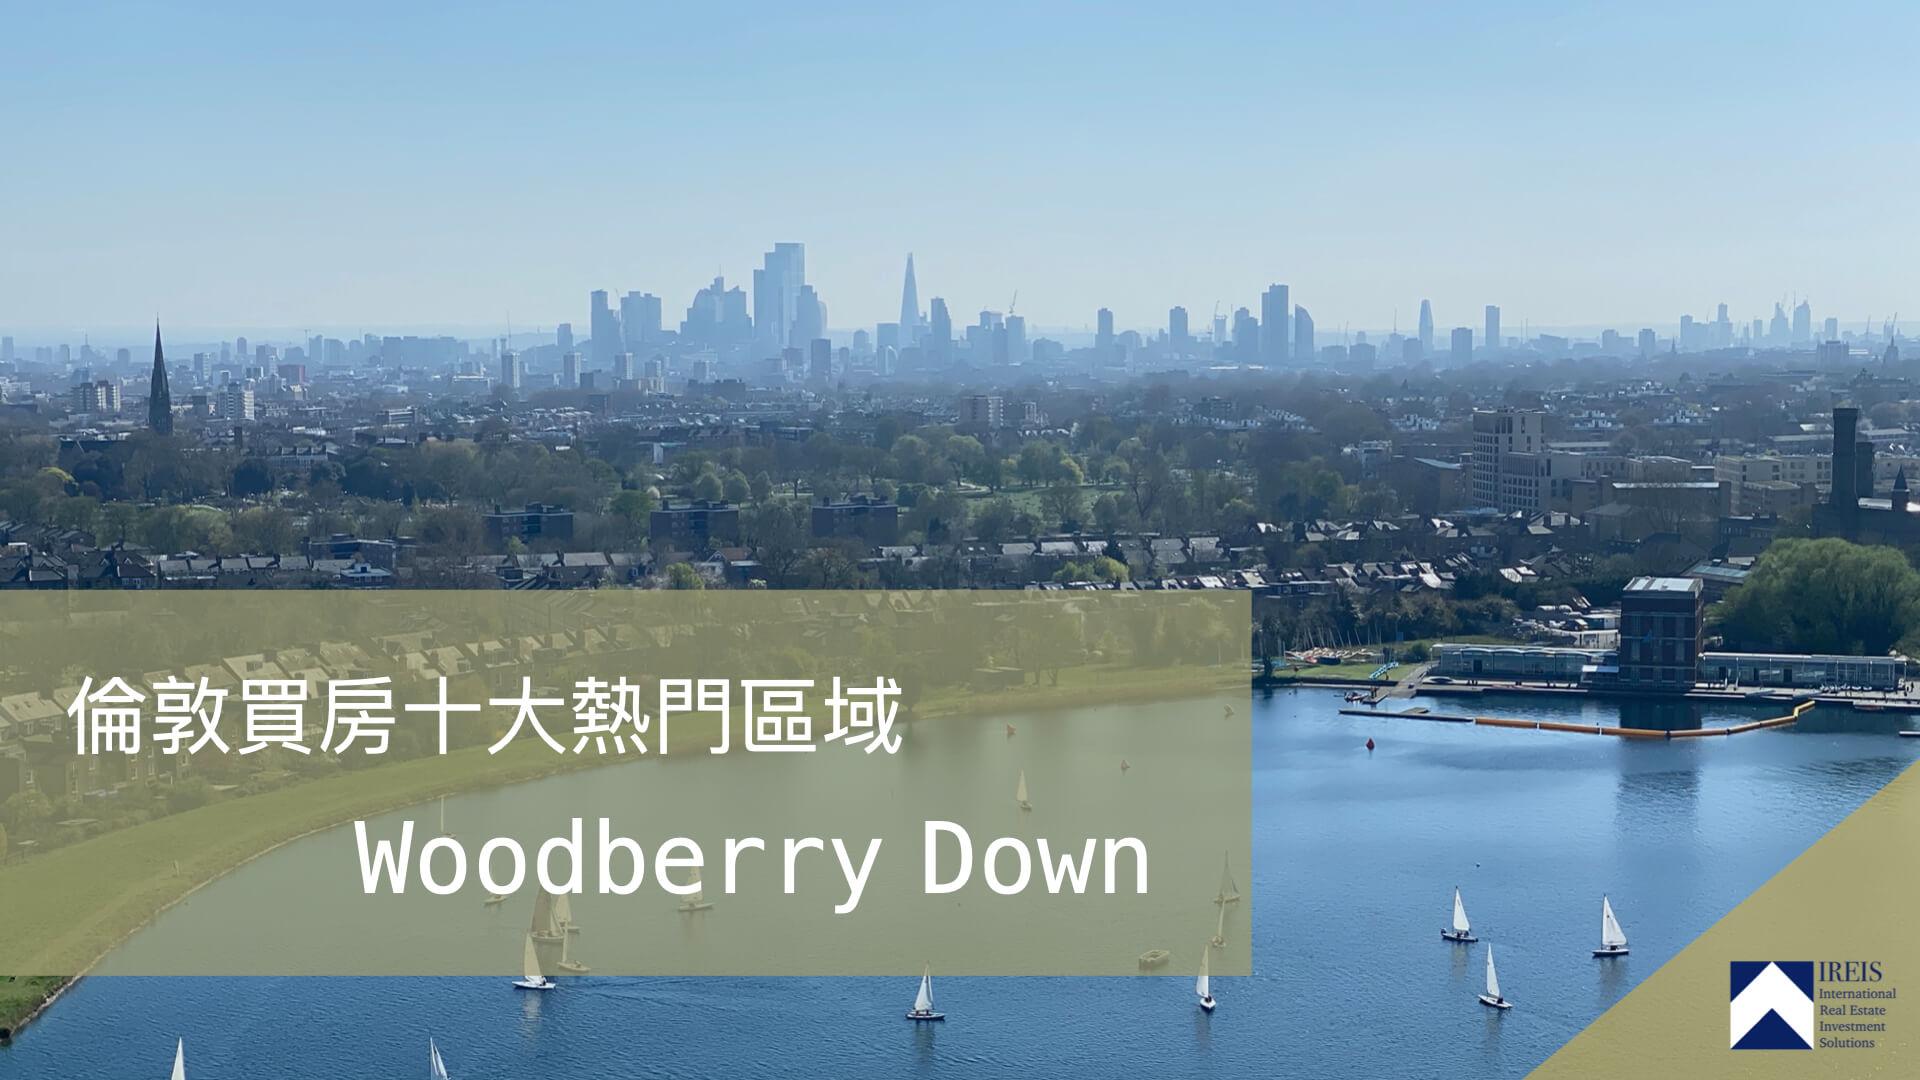 倫敦買房十大熱門區域 - Woodberry Down